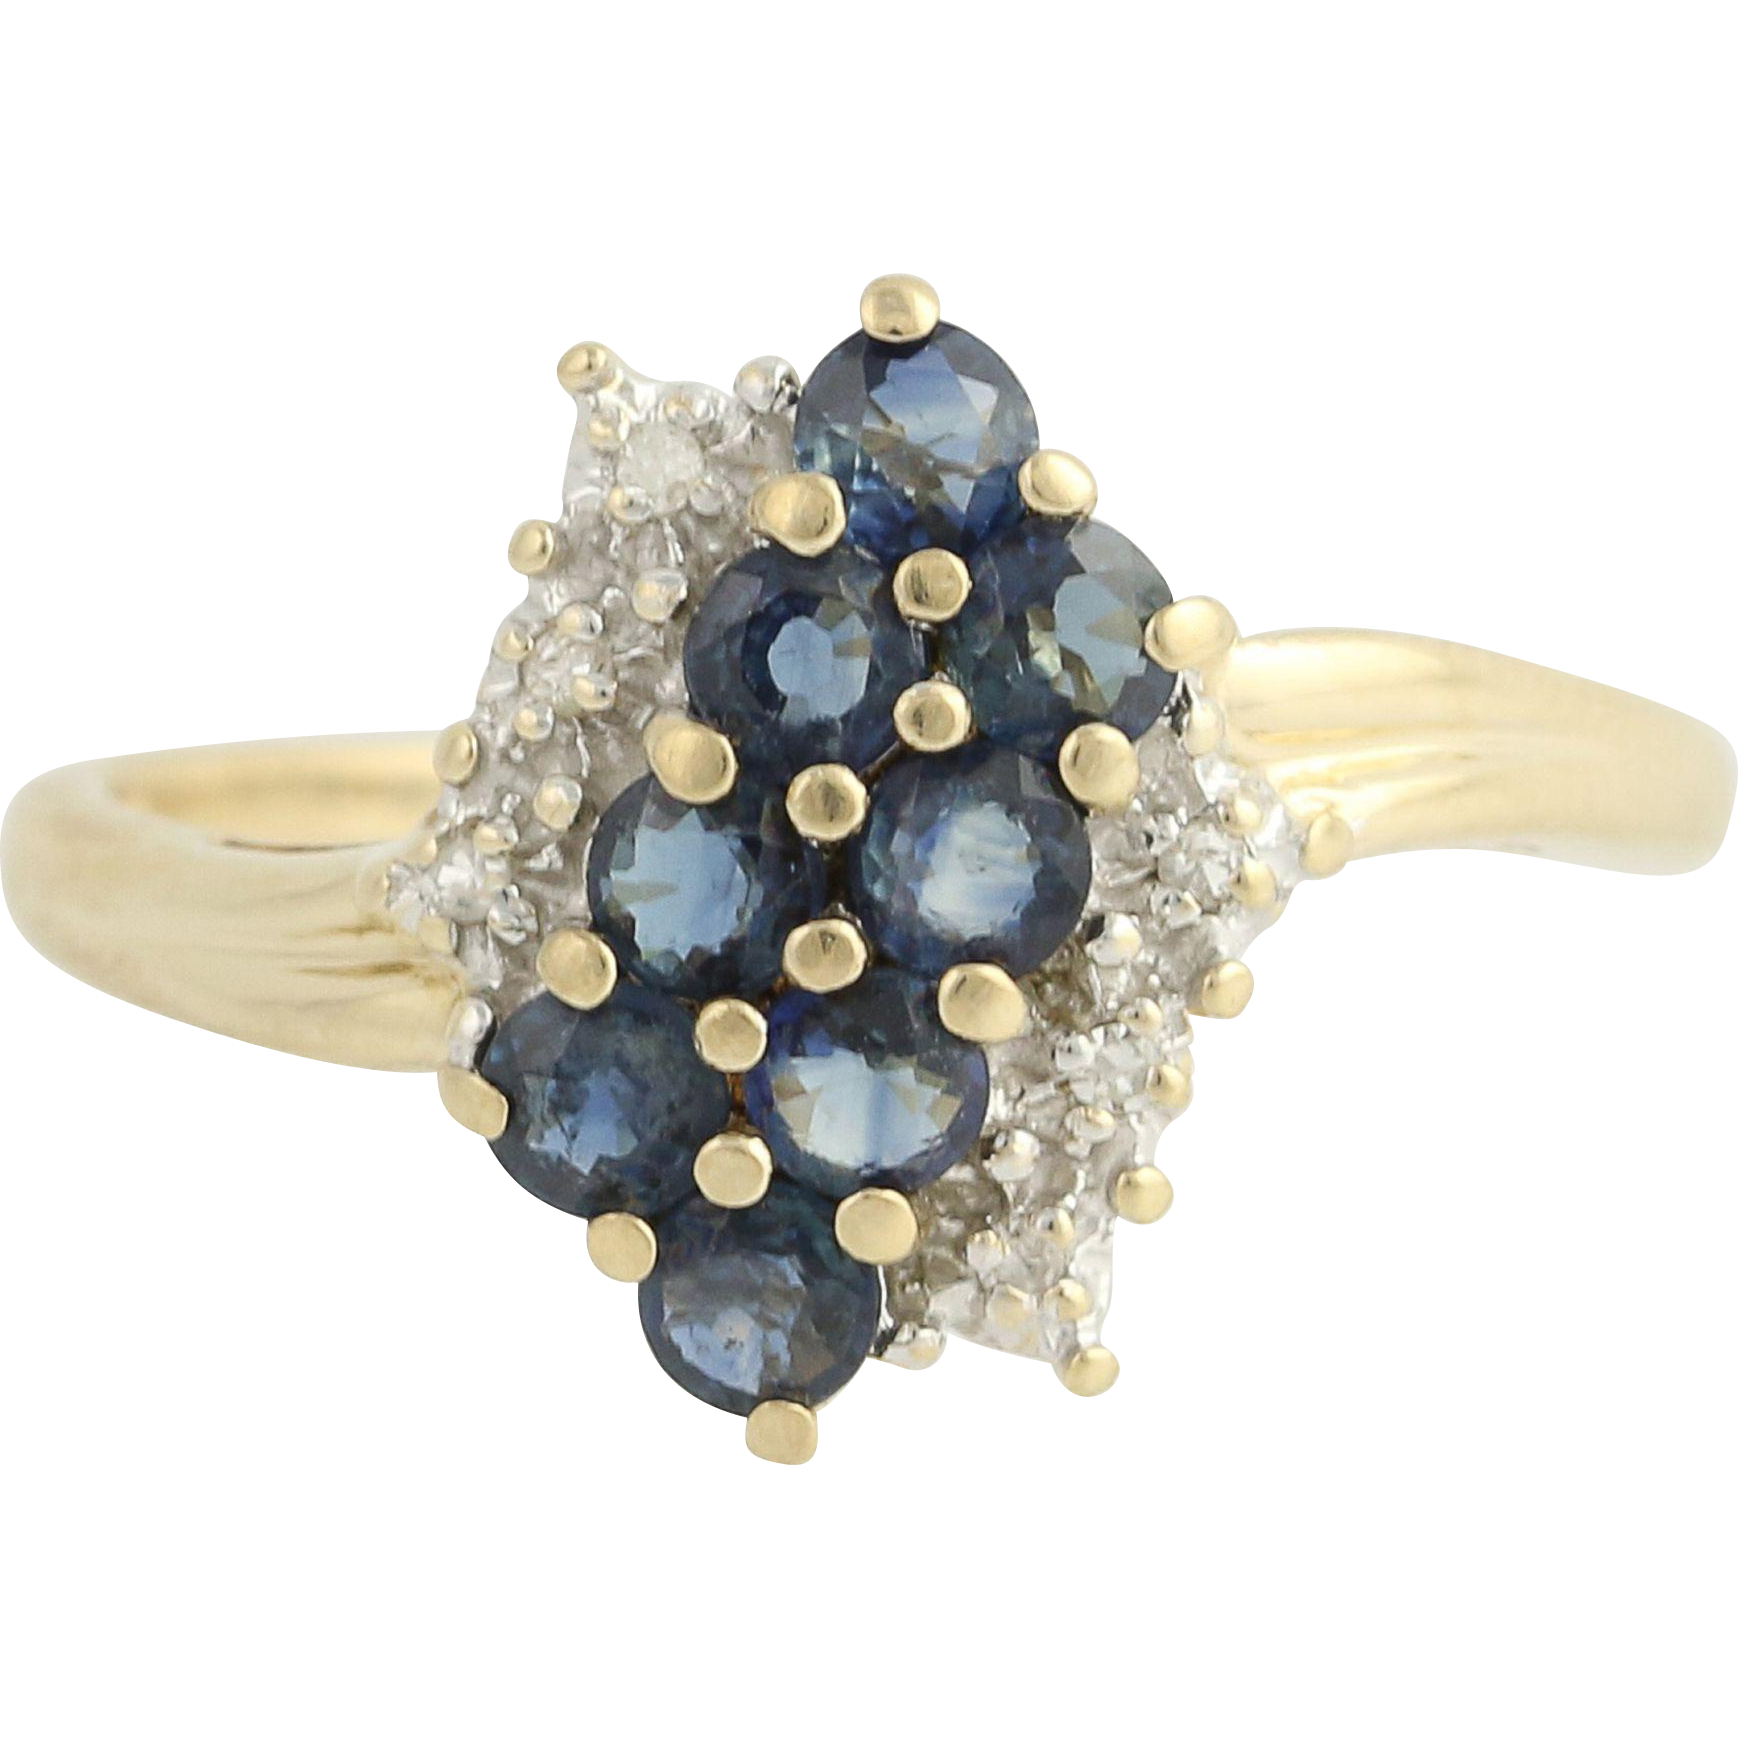 Sapphire & Diamond Bypass Ring - 10k Yellow & White Gold 1.07ctw